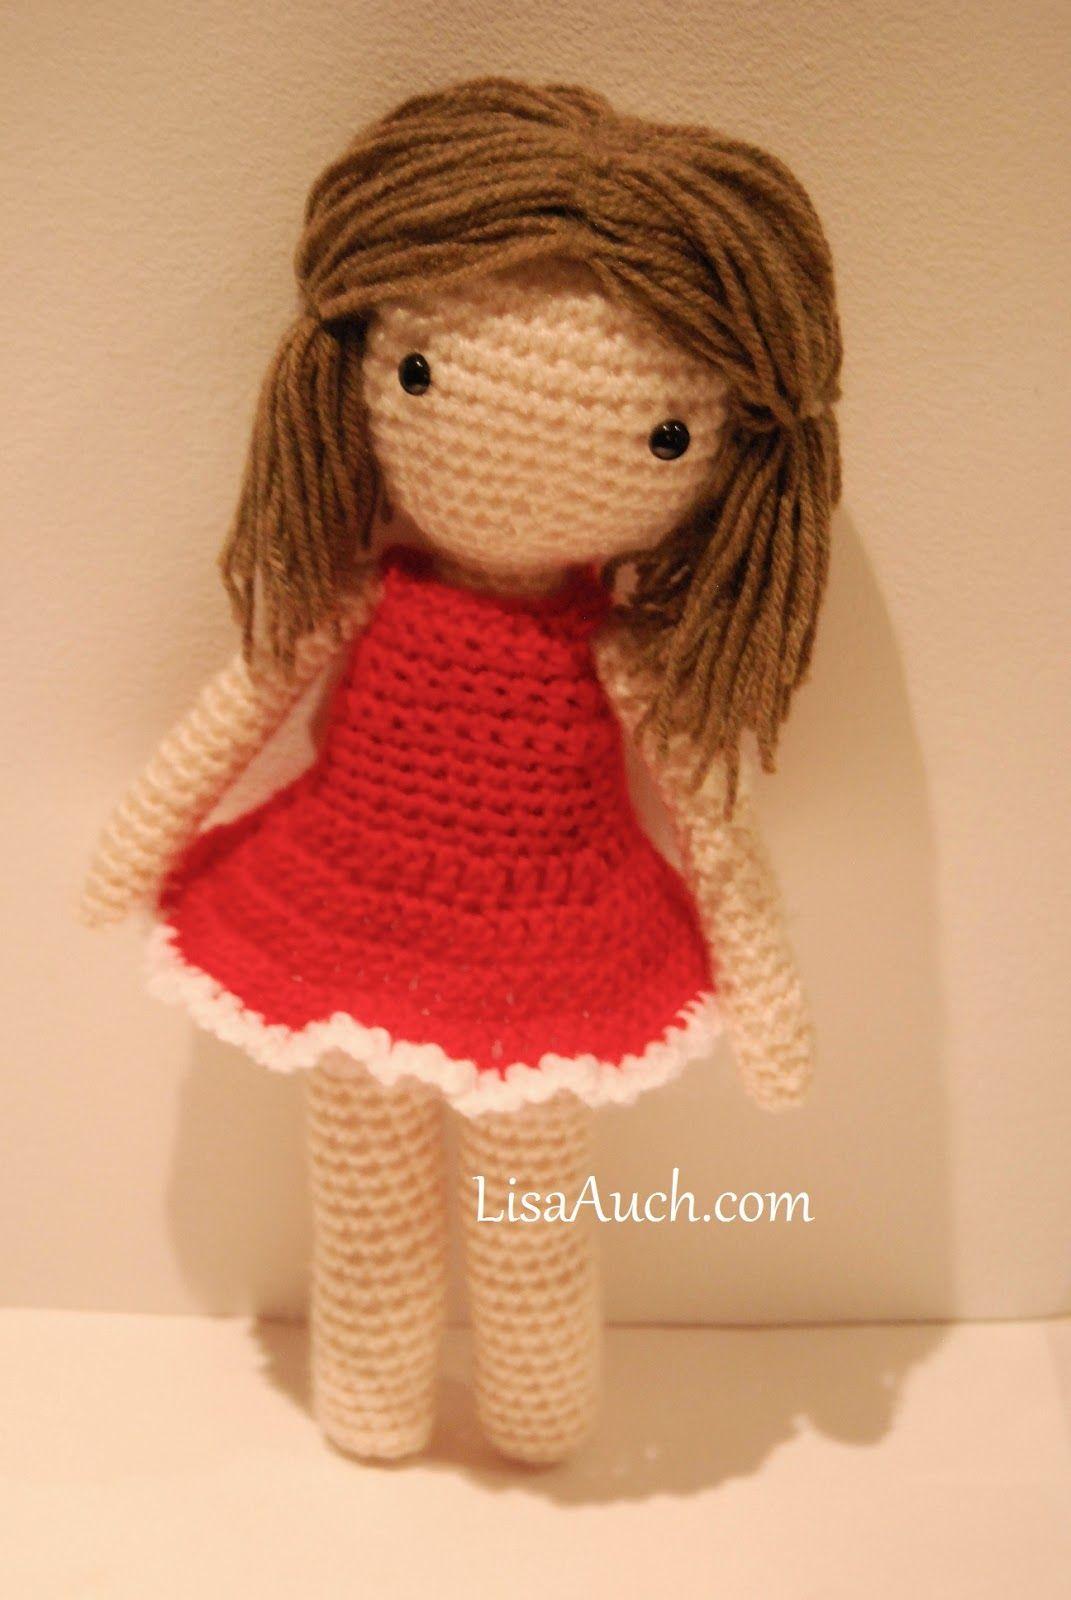 Free crochet amigurumi doll pattern with removable dress free crochet amigurumi doll pattern with removable dress bankloansurffo Choice Image